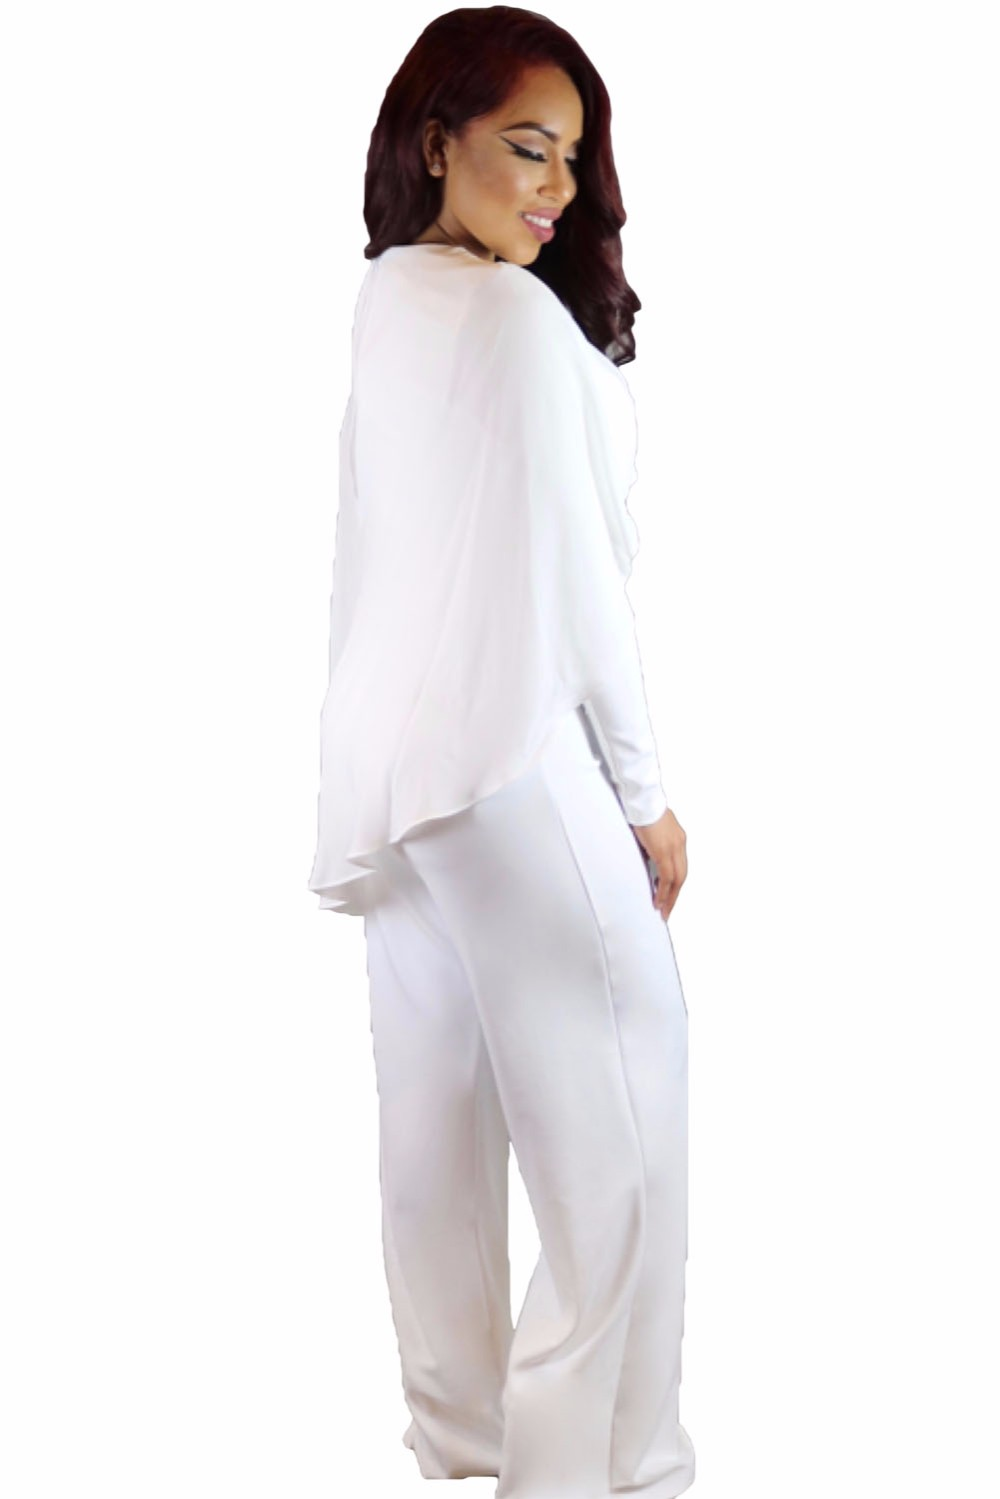 Cape-Long-Sleeves-Wide-Leg-Jumpsuit-LC64203-1-2